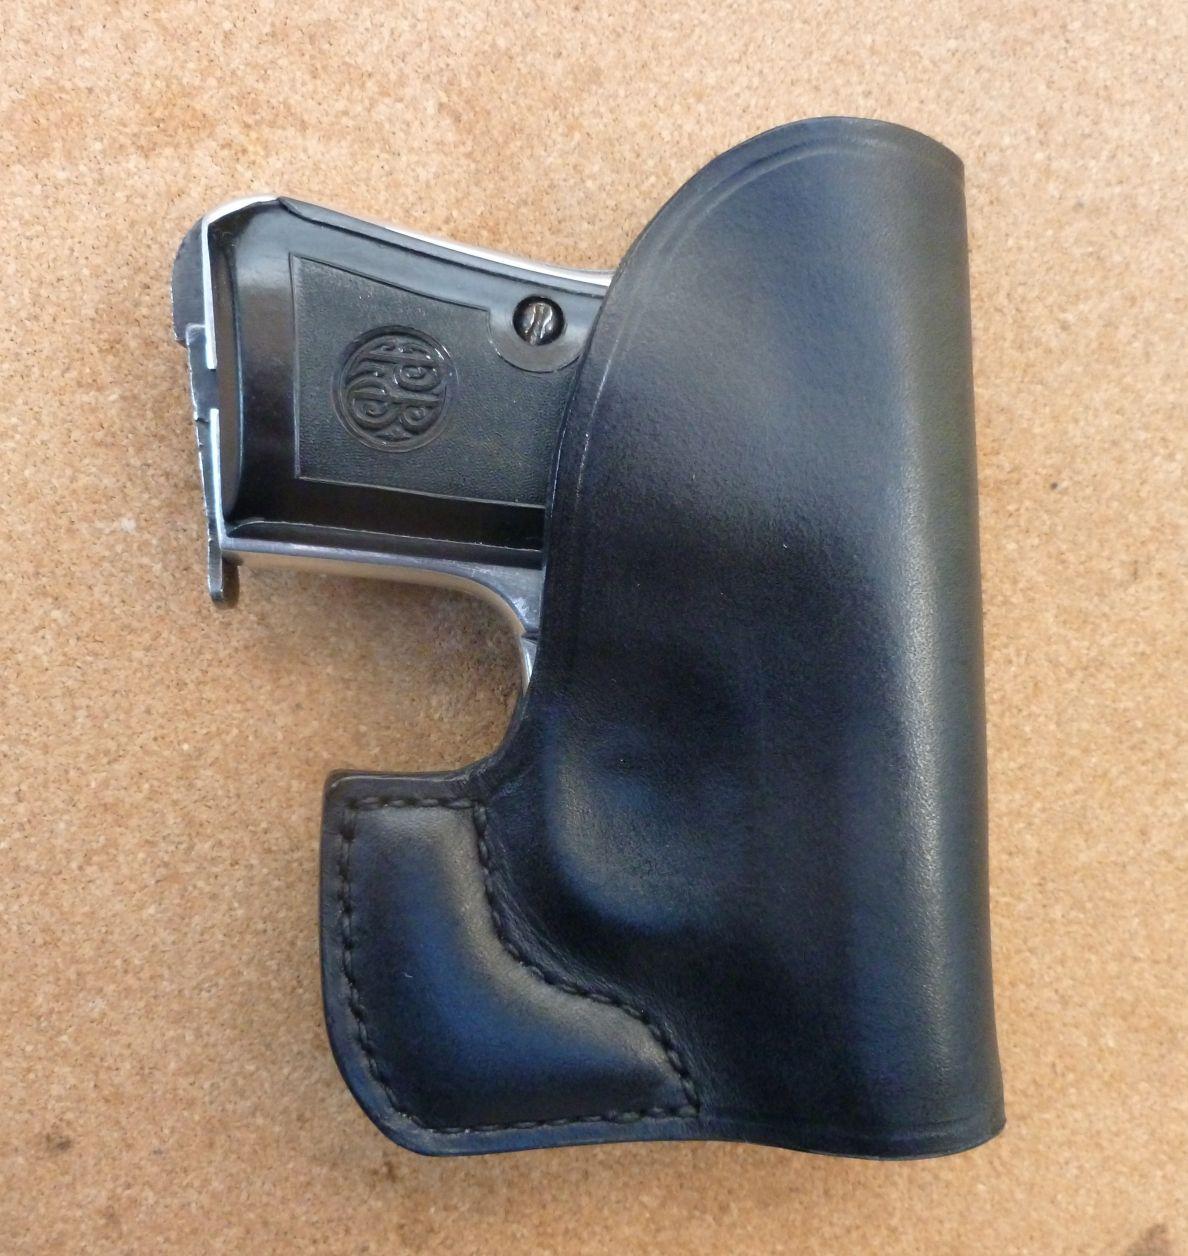 A sleek pocket carry design for the original James Bond pistols